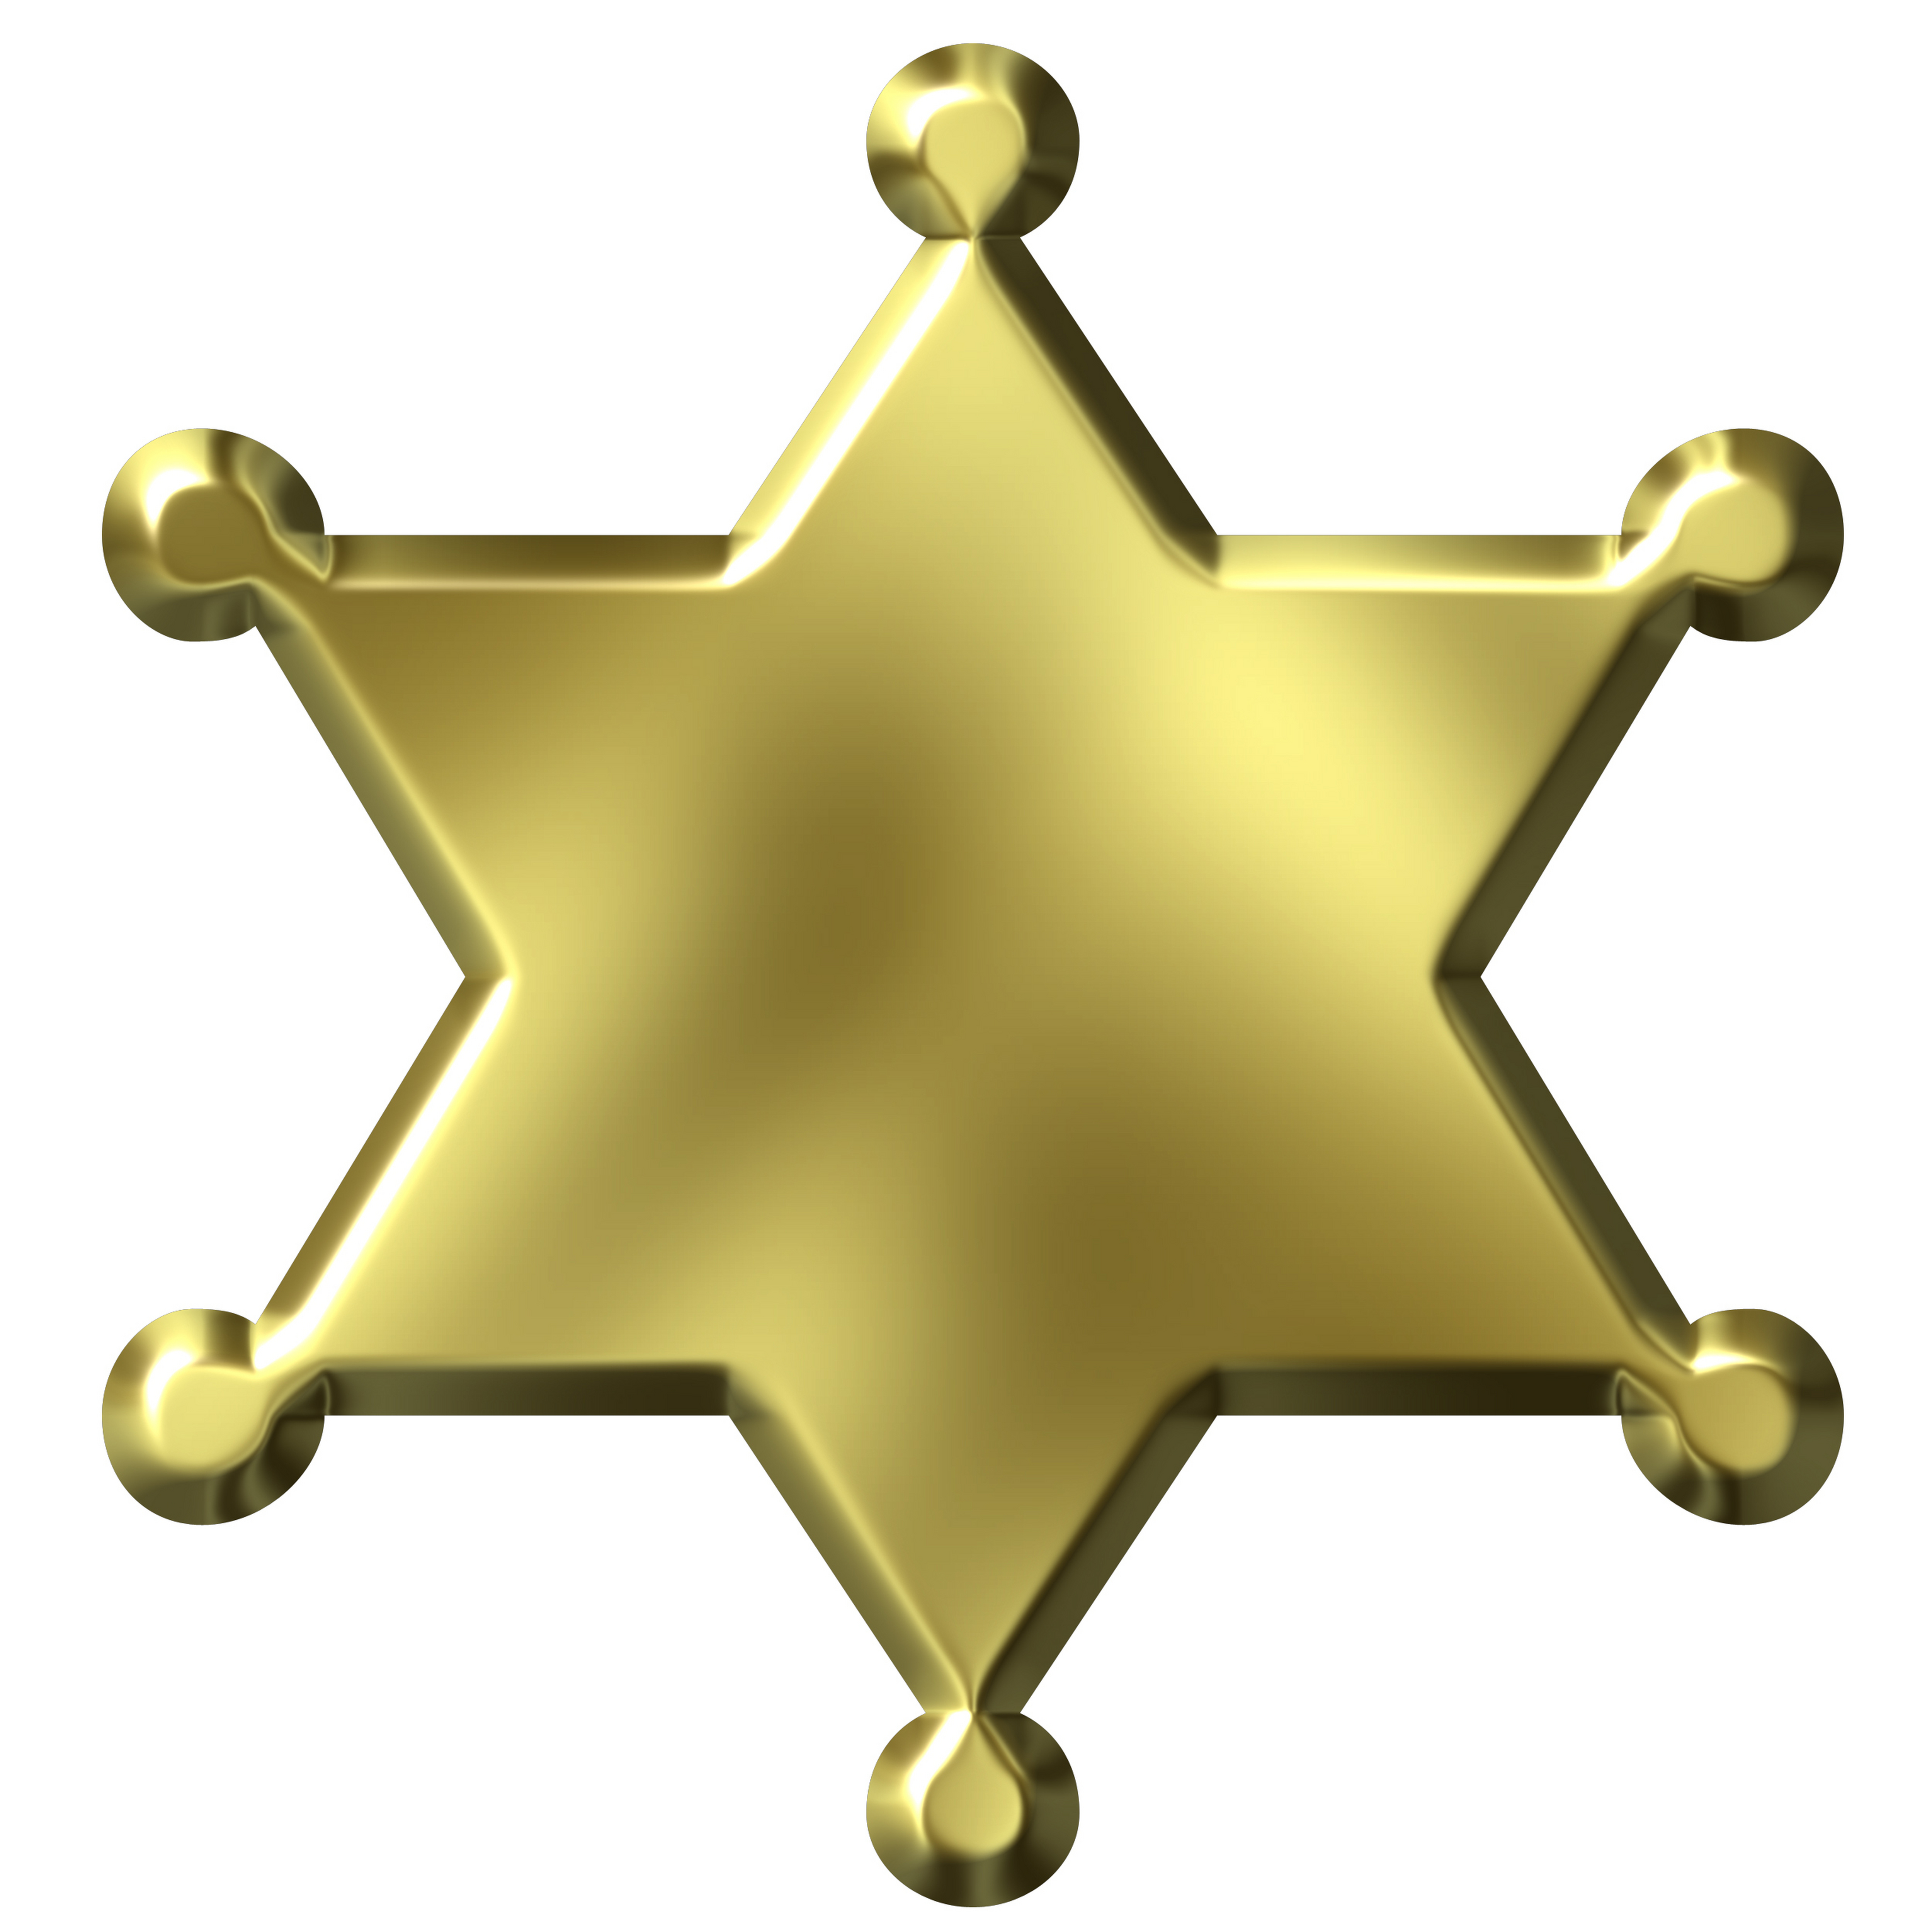 5000x5000 Sheriff Badge Template. Free Printable Sheriff Badge Template